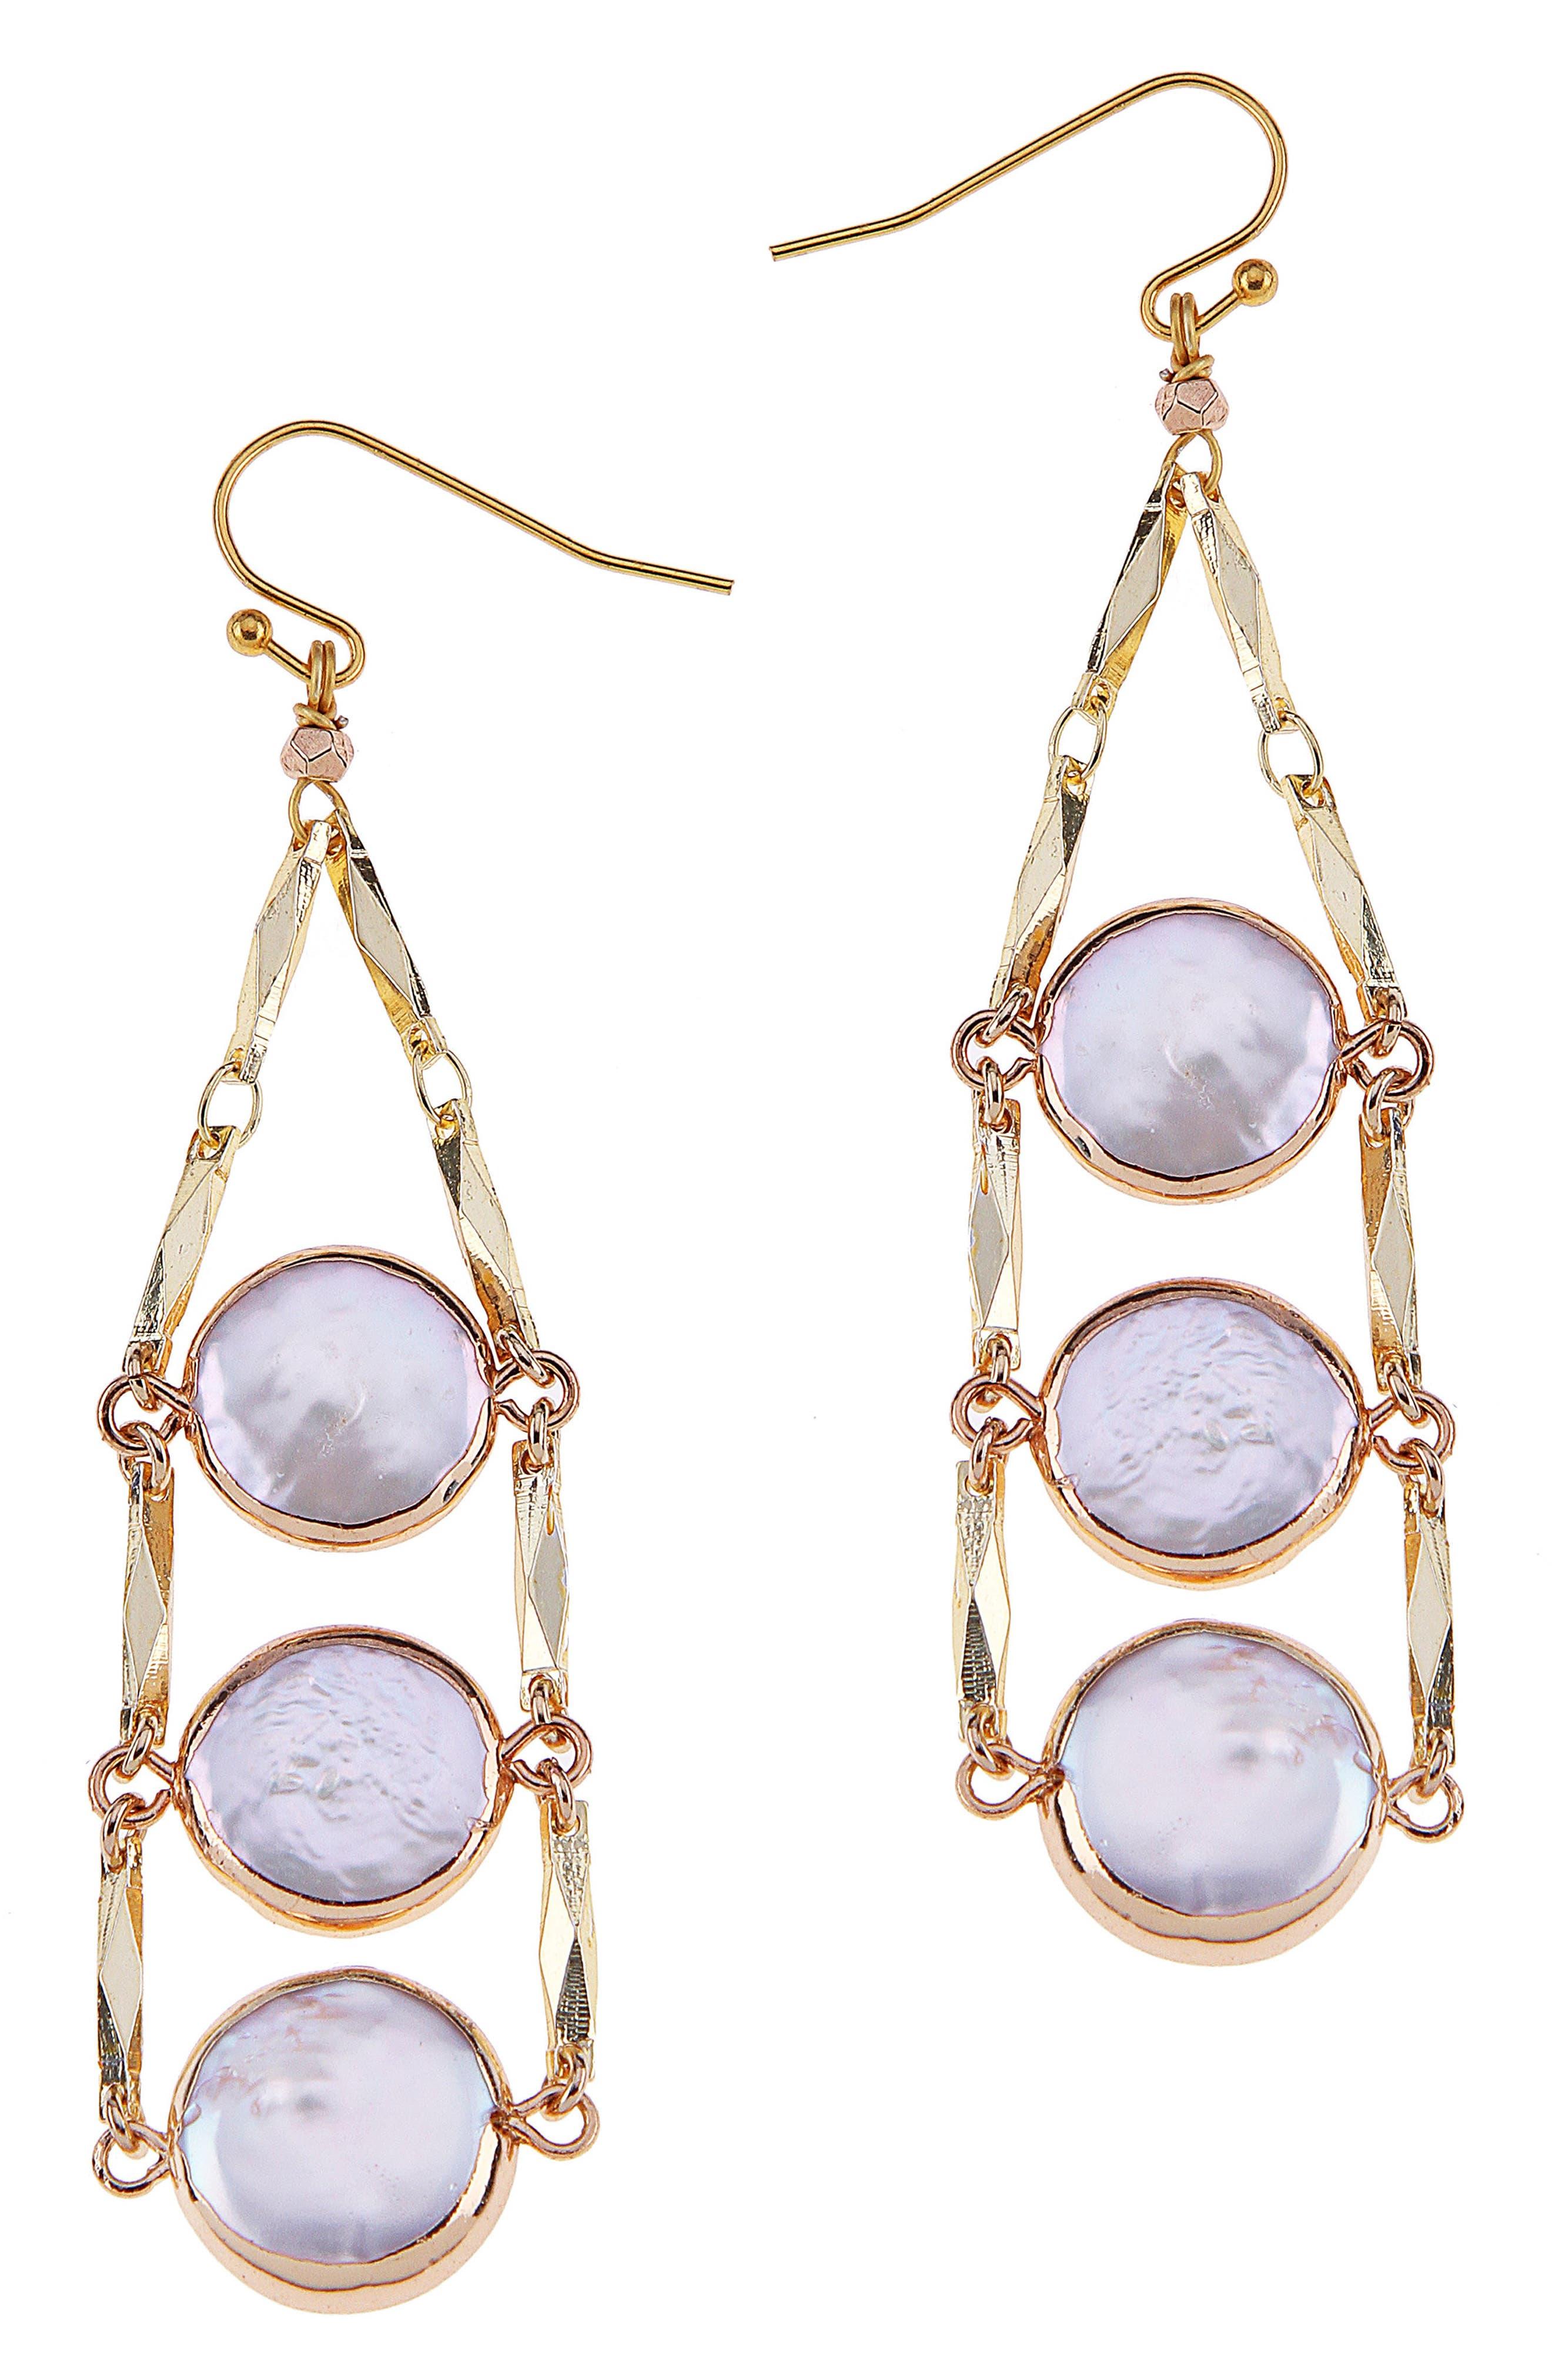 Triple Coin Freshwater Pearl Drop Earrings,                             Main thumbnail 1, color,                             White